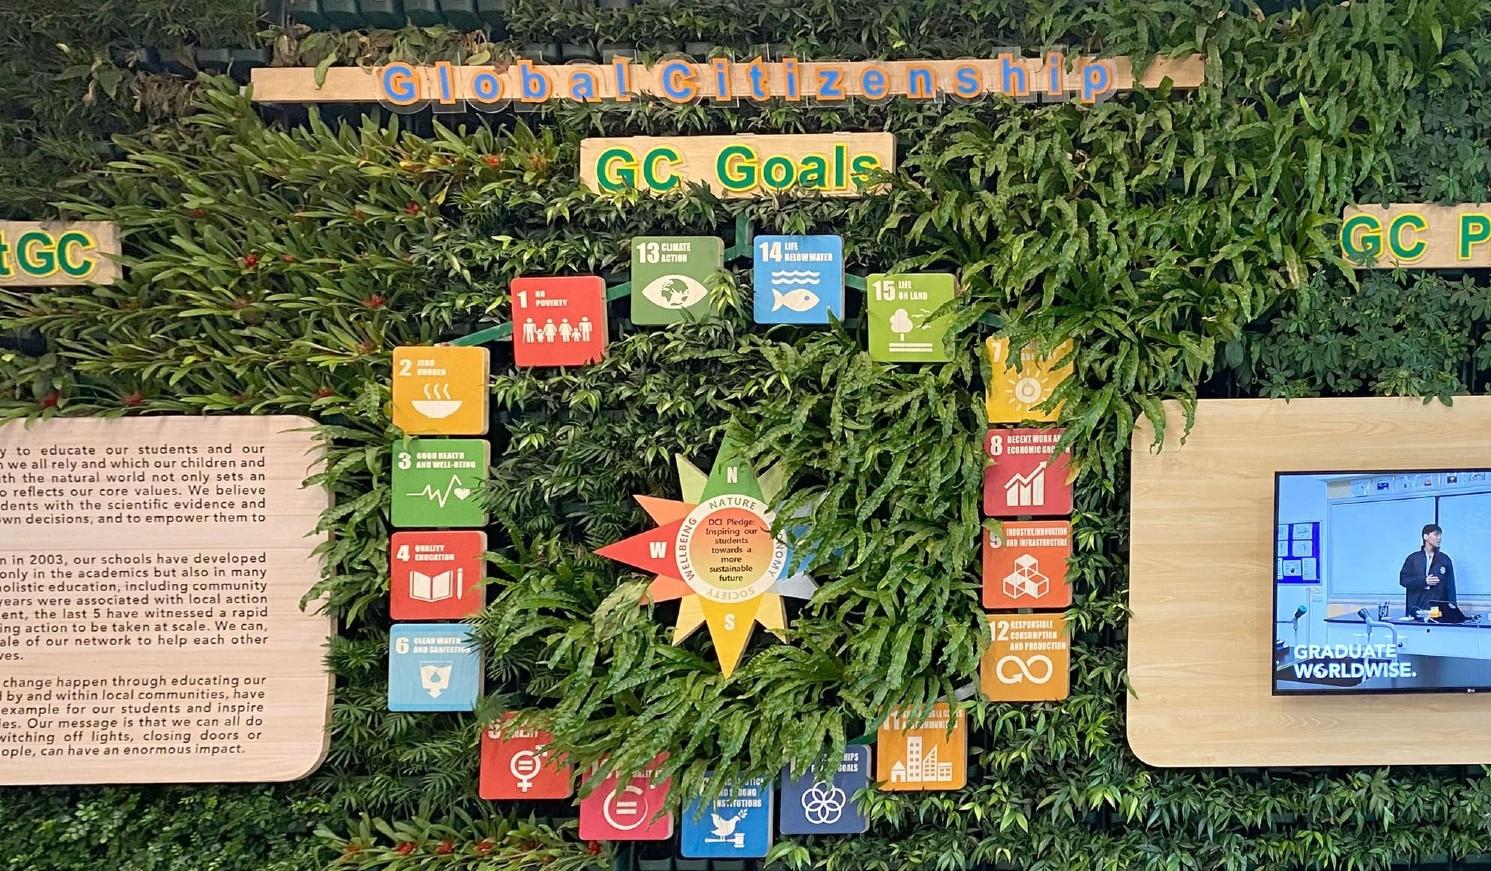 01-image-global-citzenship-fsw-pix